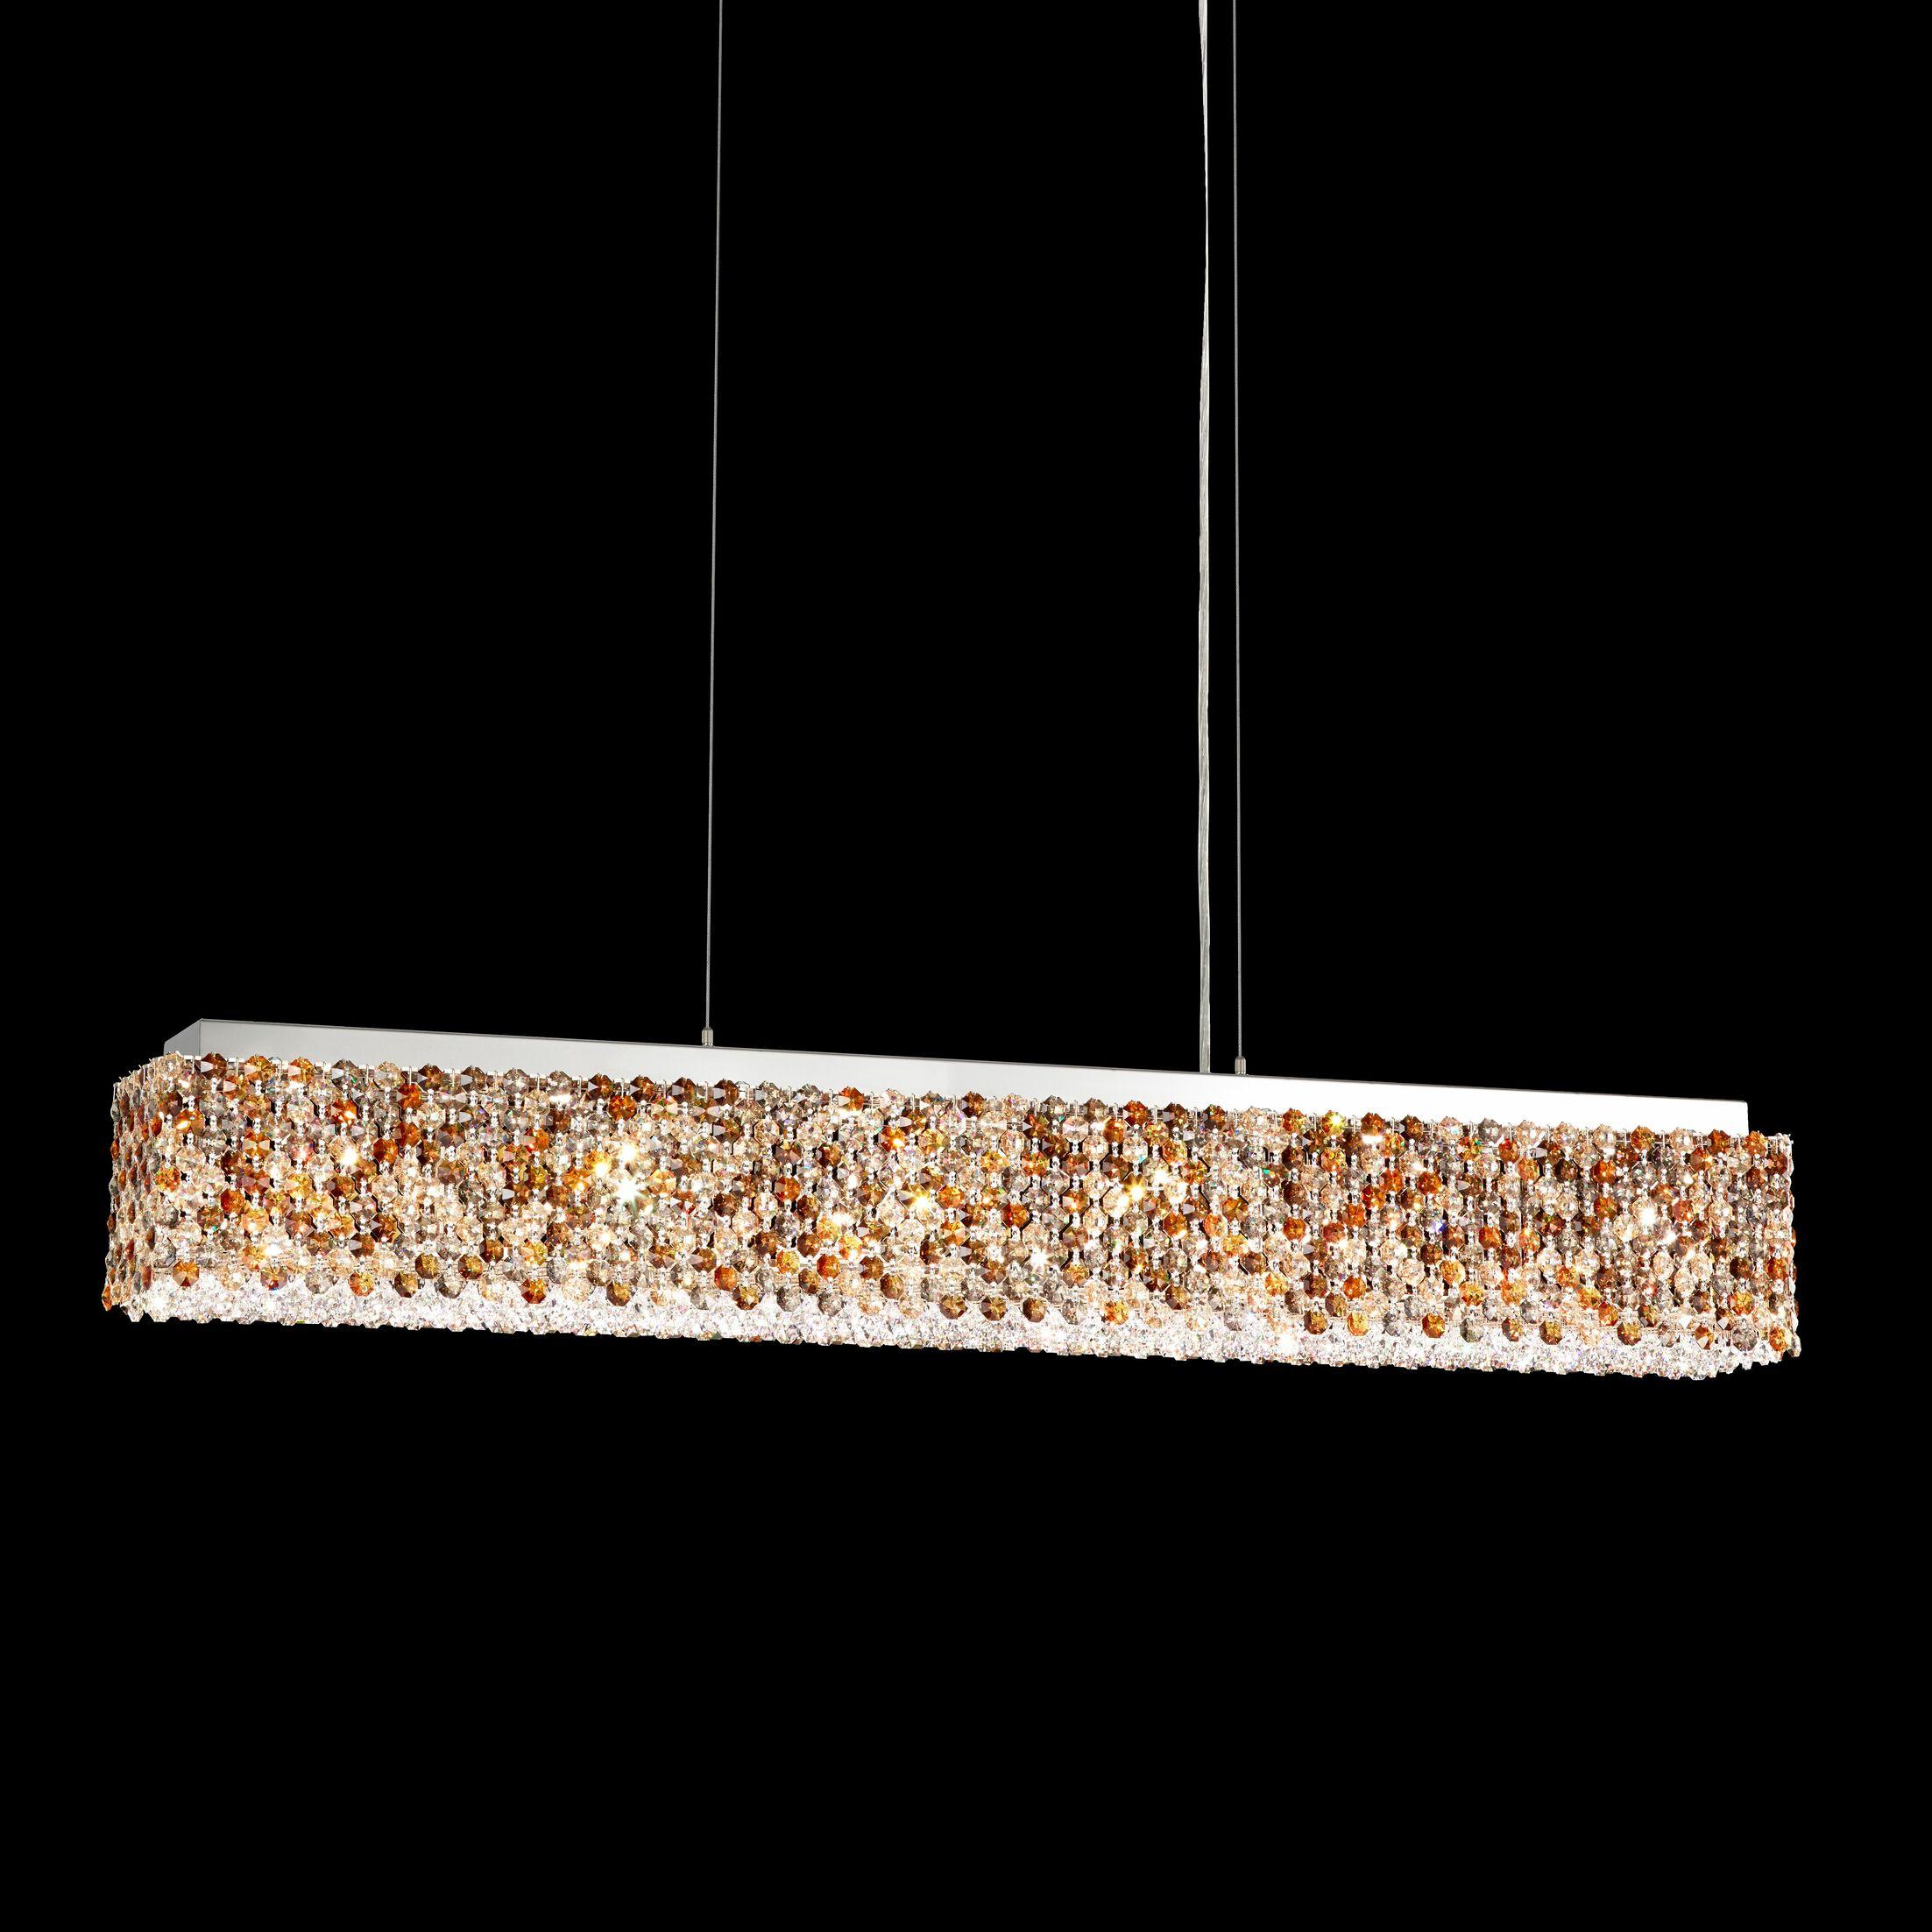 Refrax 6-Light Crystal Chandelier Crystal: Golden Teak from Swarovski